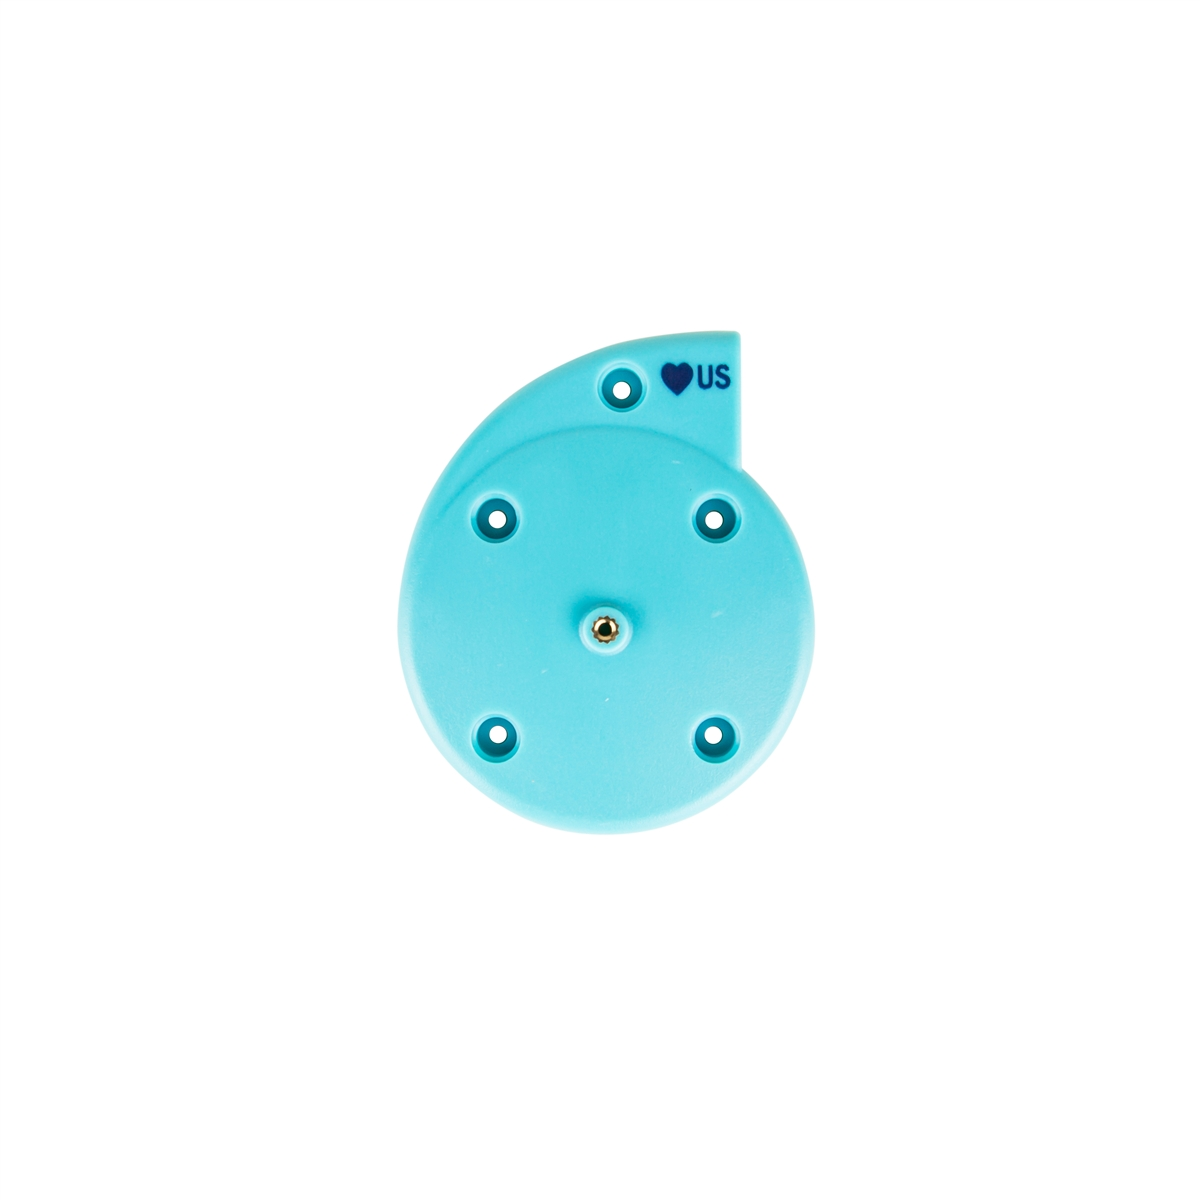 GE Corometrics Nautilus 5700HAX Ultrasound Transducer Top Case Cover With Knob